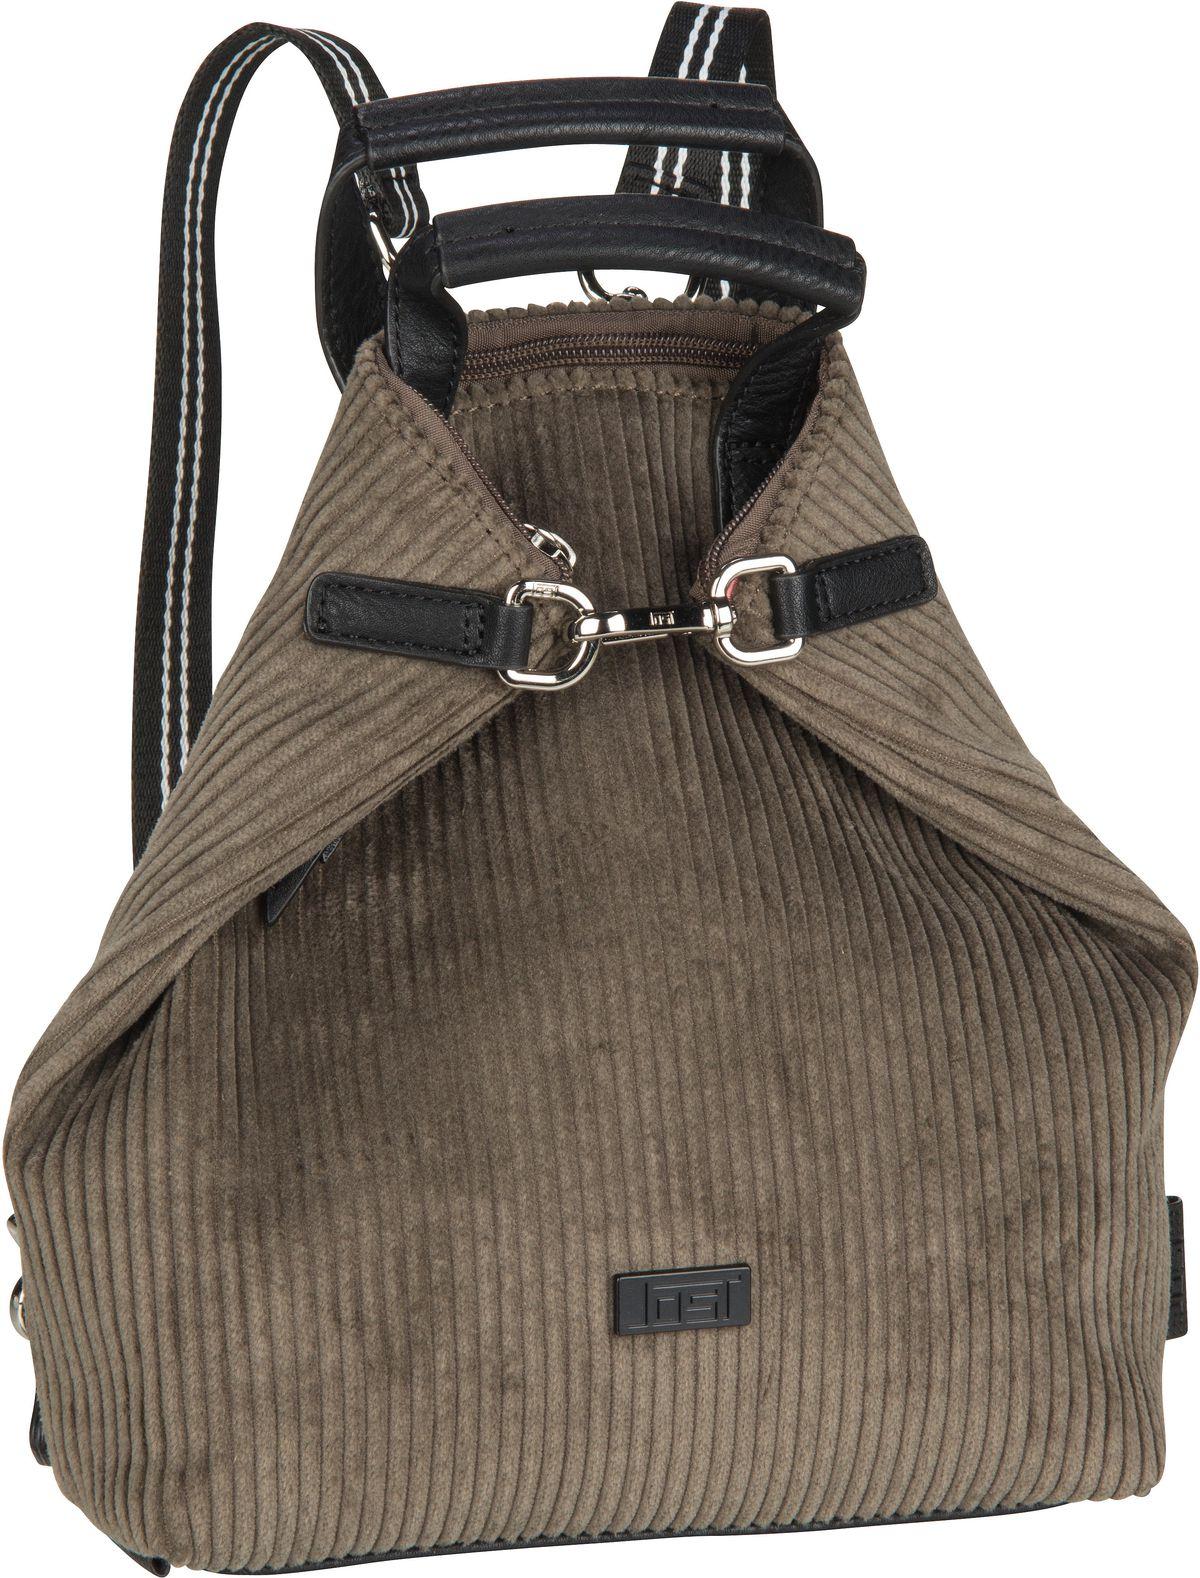 Rucksack / Daypack Cord 7943 X-Change Bag Mini Olive